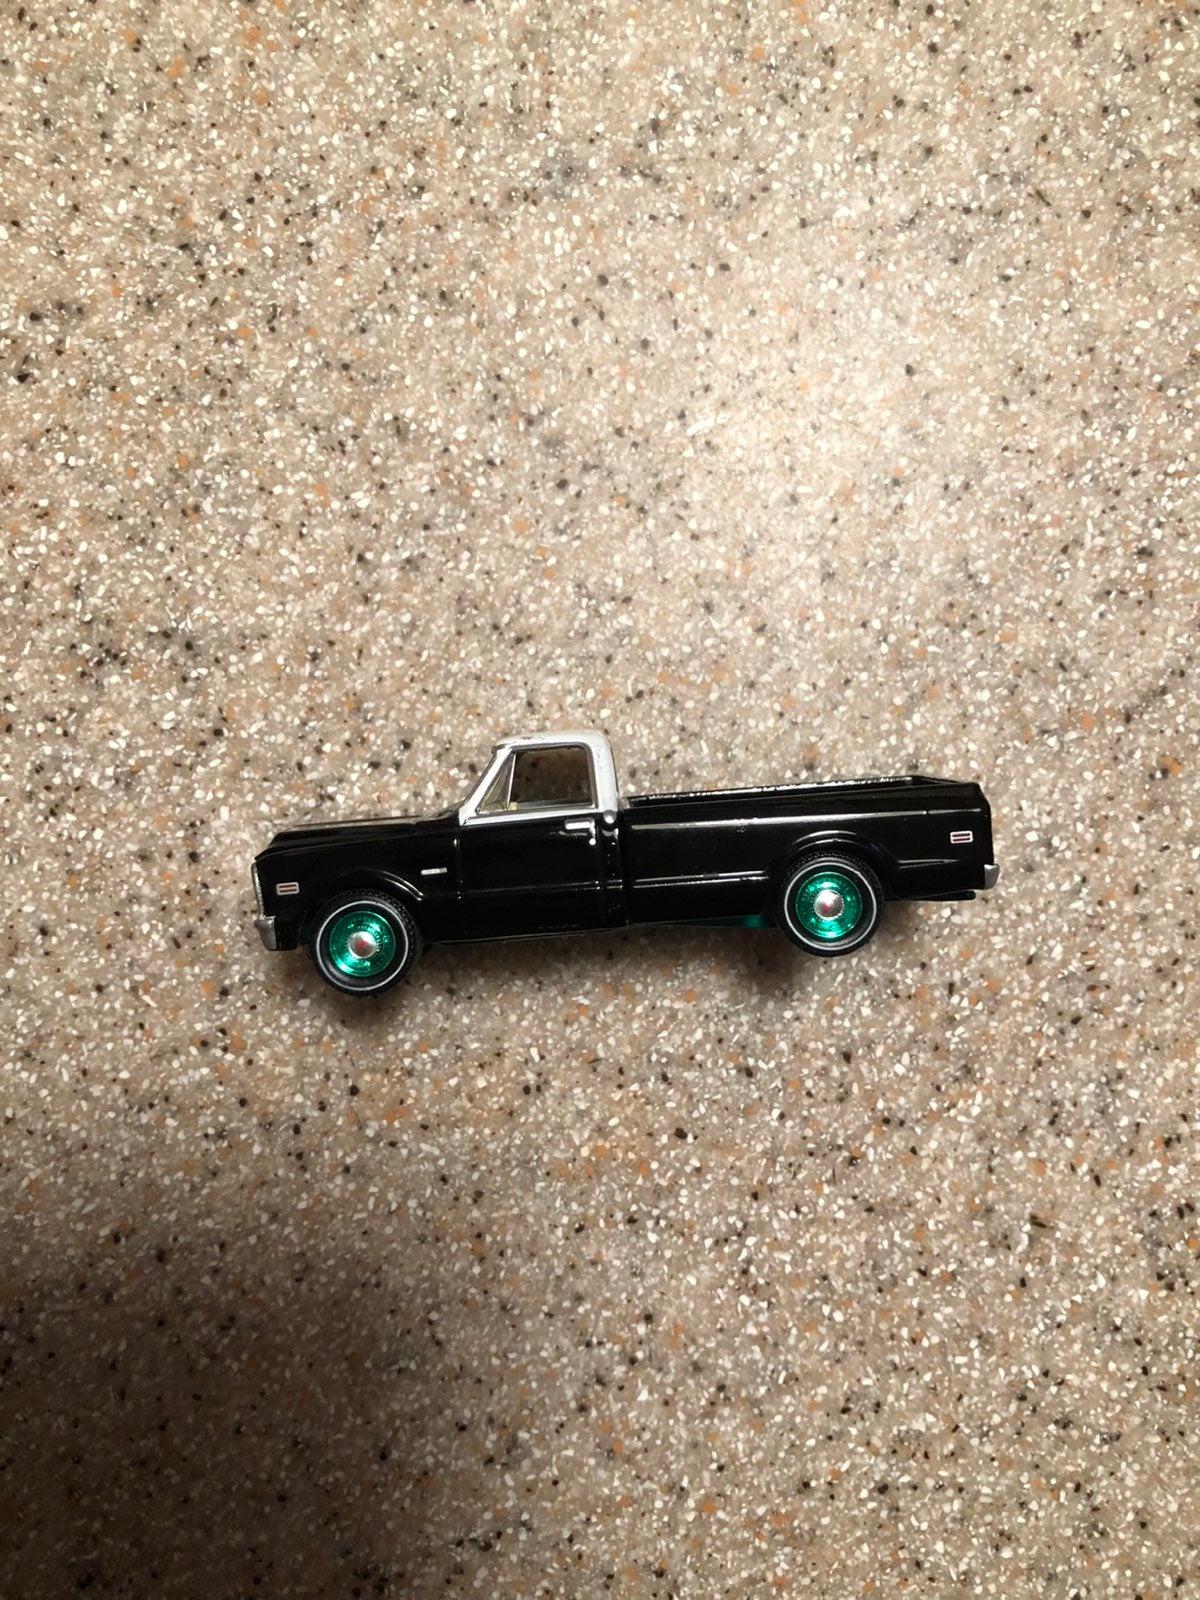 Greenlight Black Bandit 1972 Chevy C10